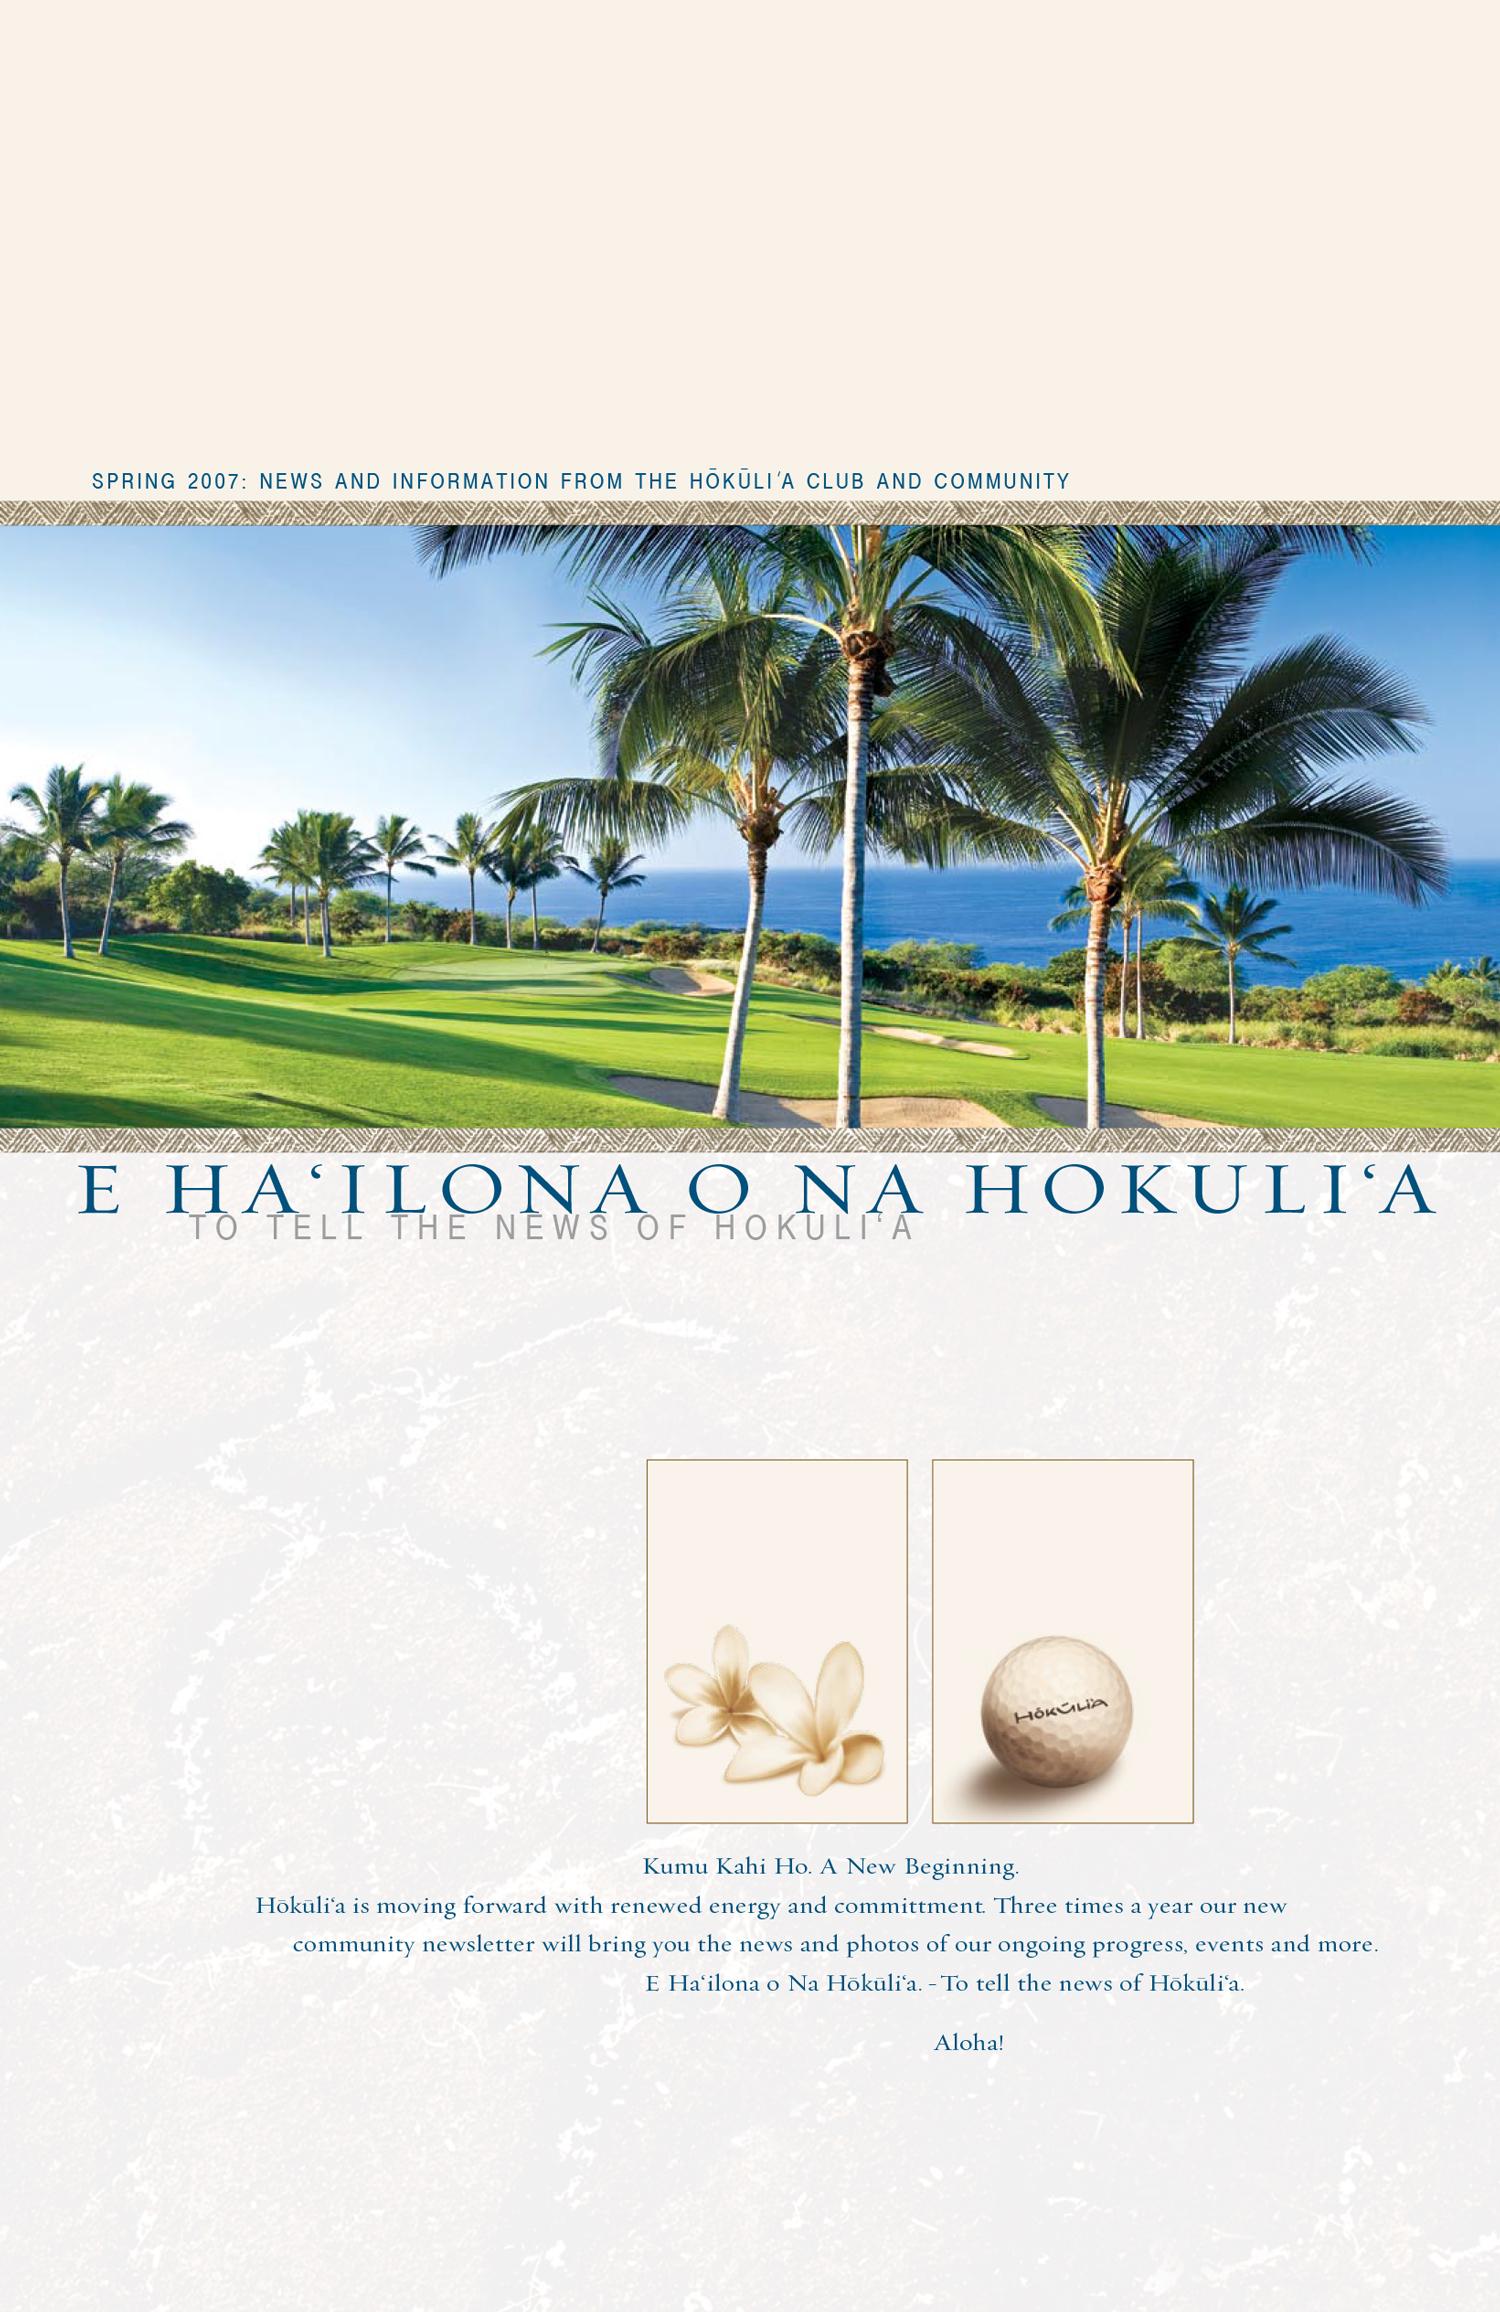 Hokulia-spread-A1.jpg